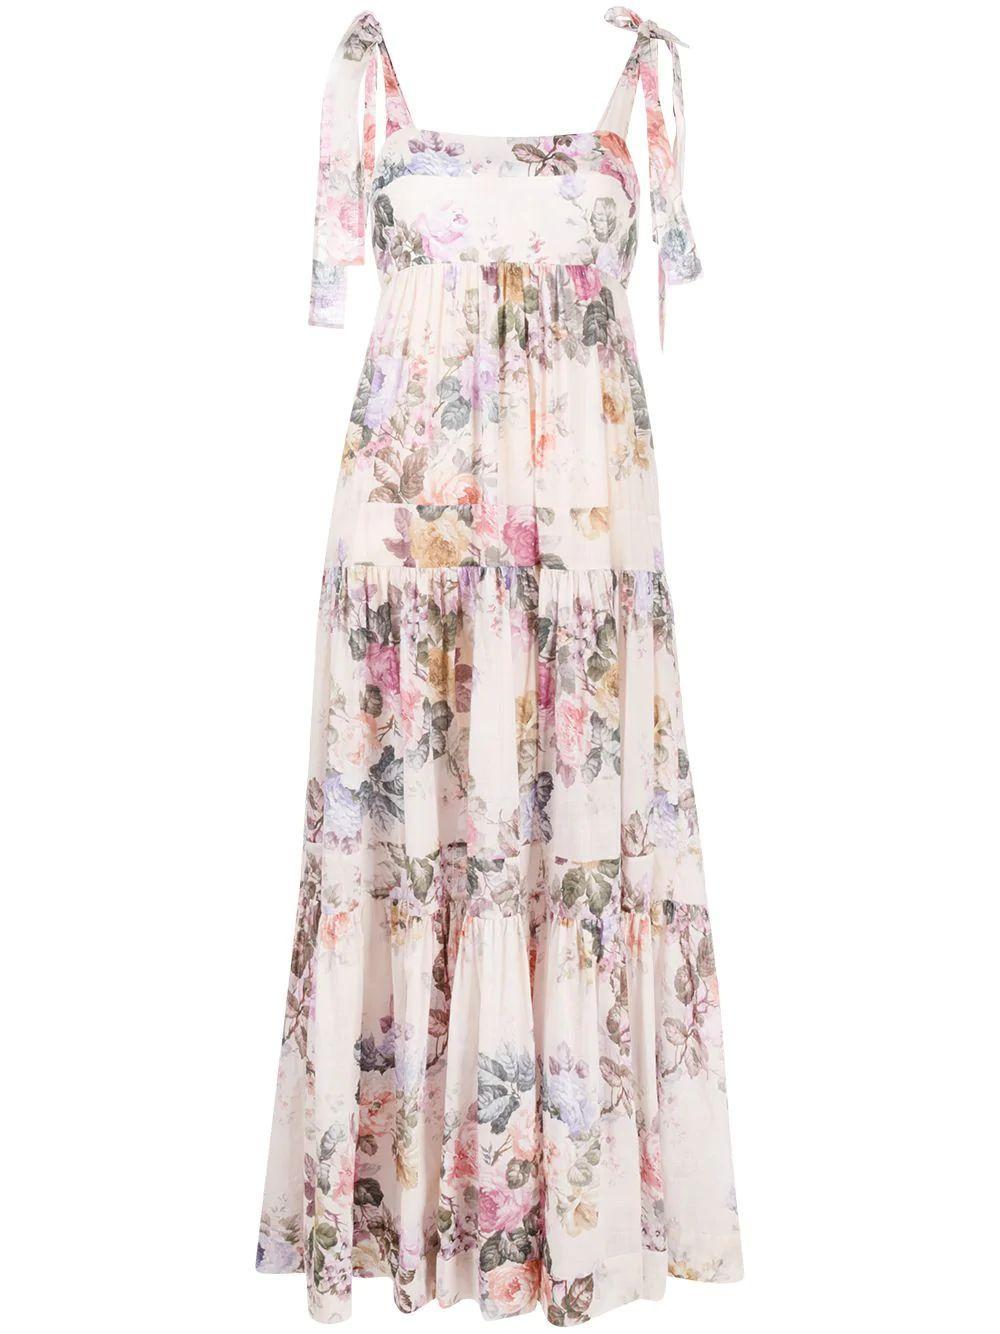 Brighton Dress